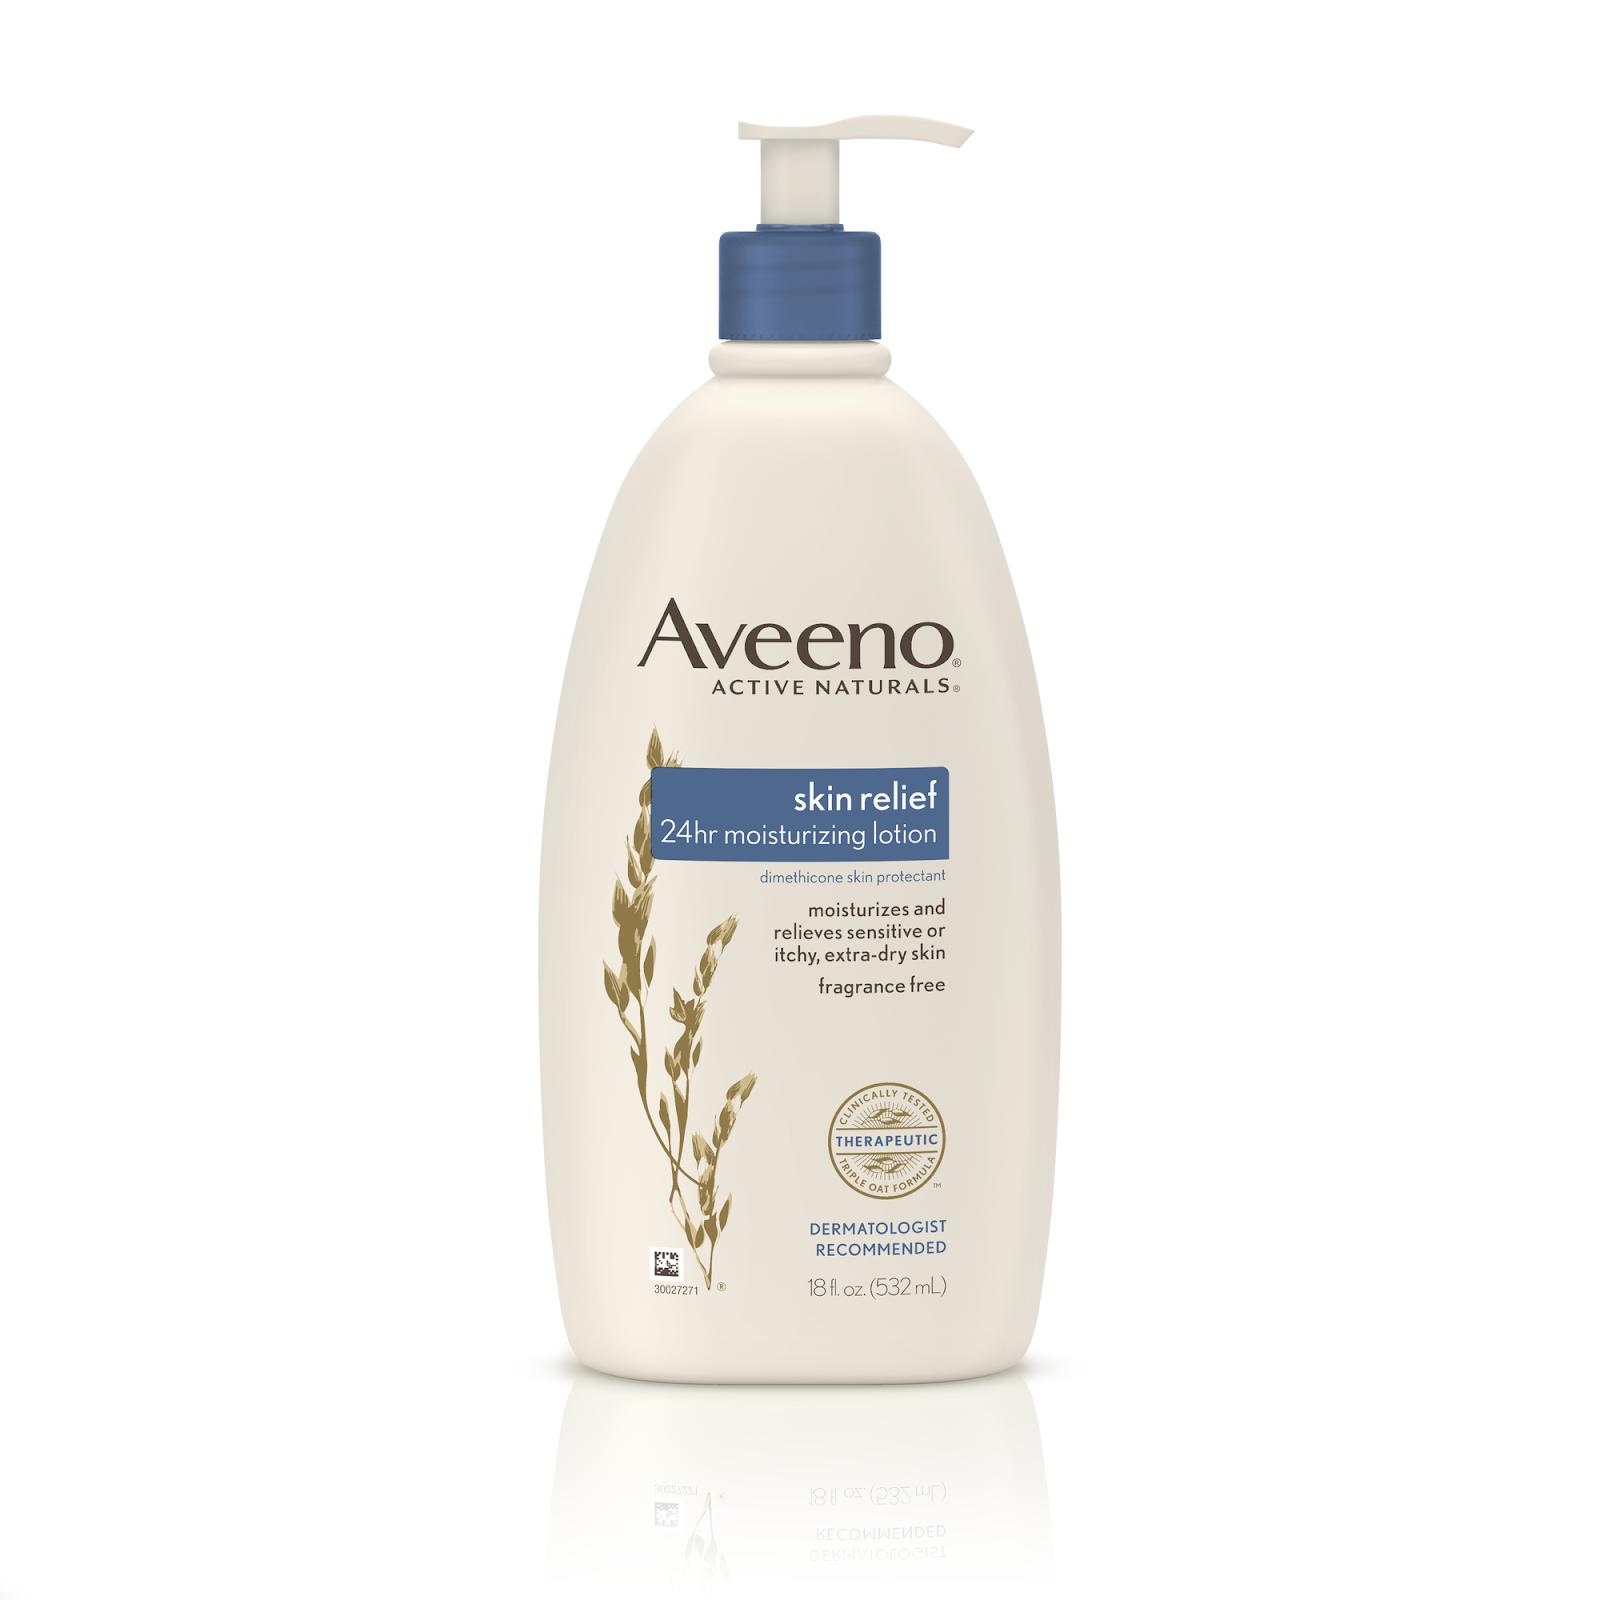 Aveeno Skin Relief: $11.99